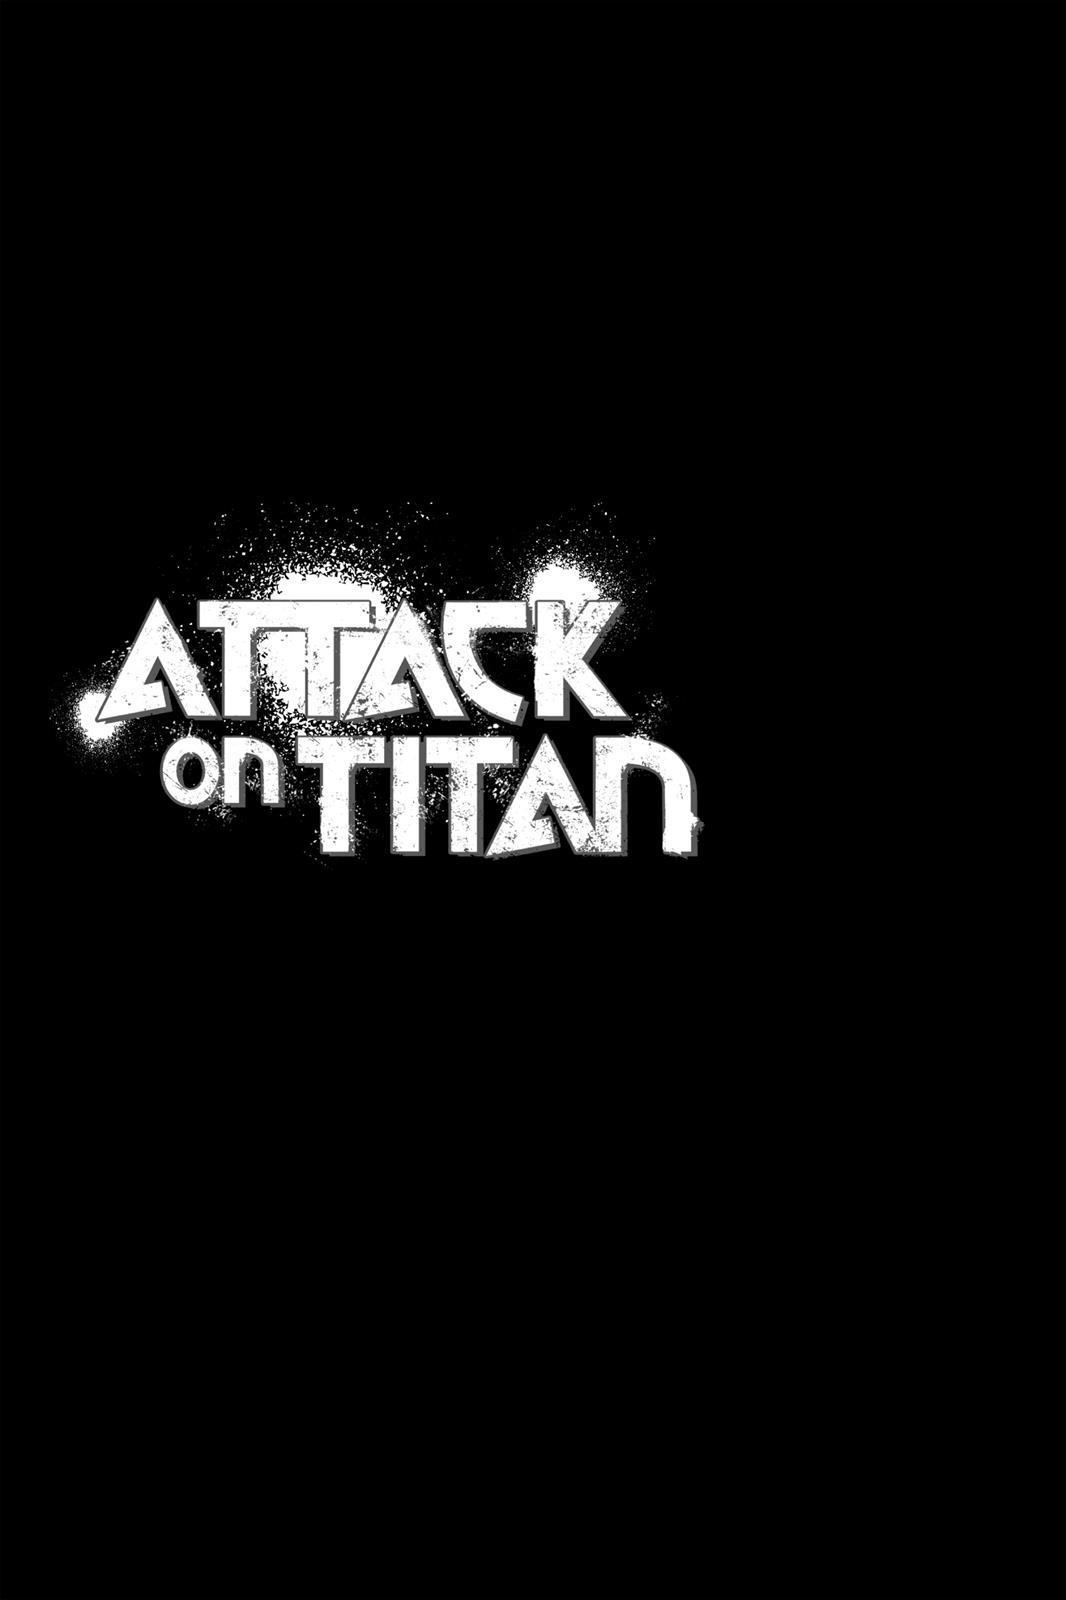 Attack On Titan, Episode 15 image 038